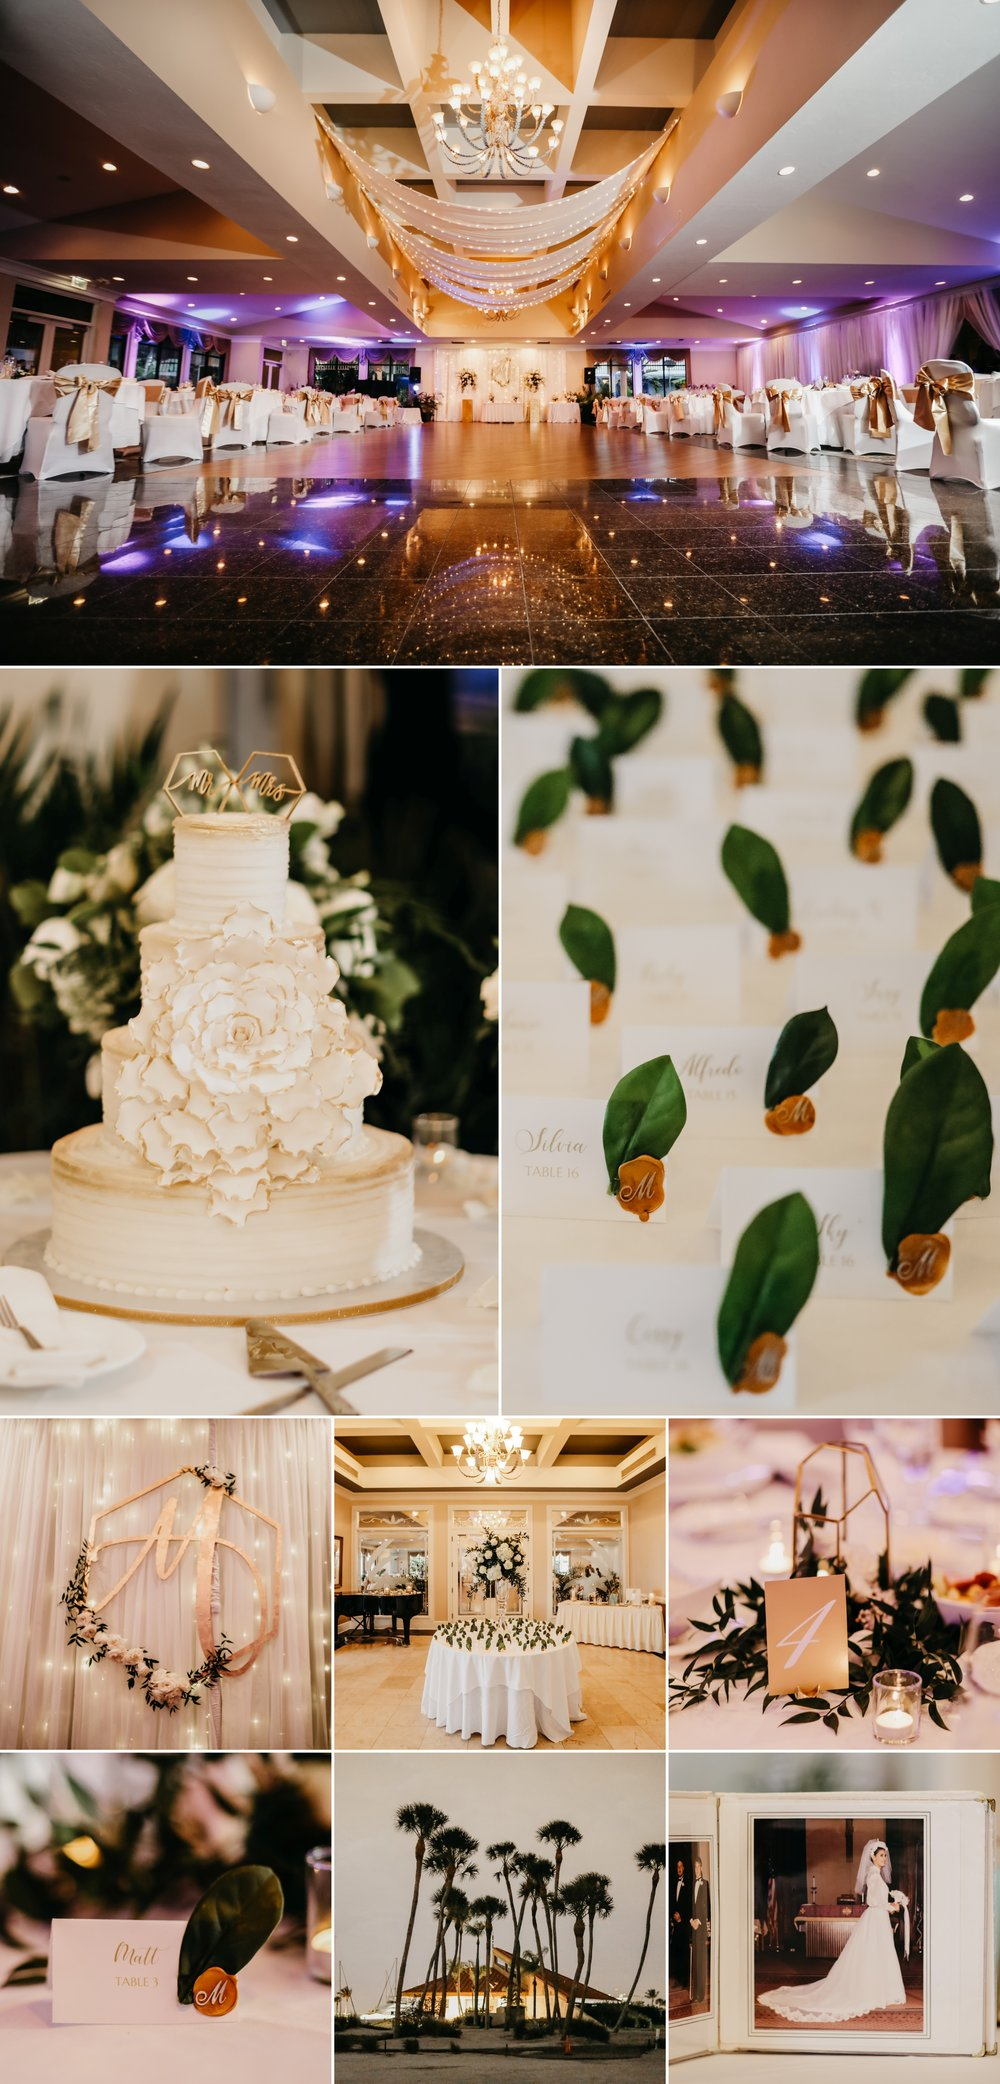 Luxe_tropical_travel_destination_wedding_photography_ShainaDeCiryan.com26.jpg